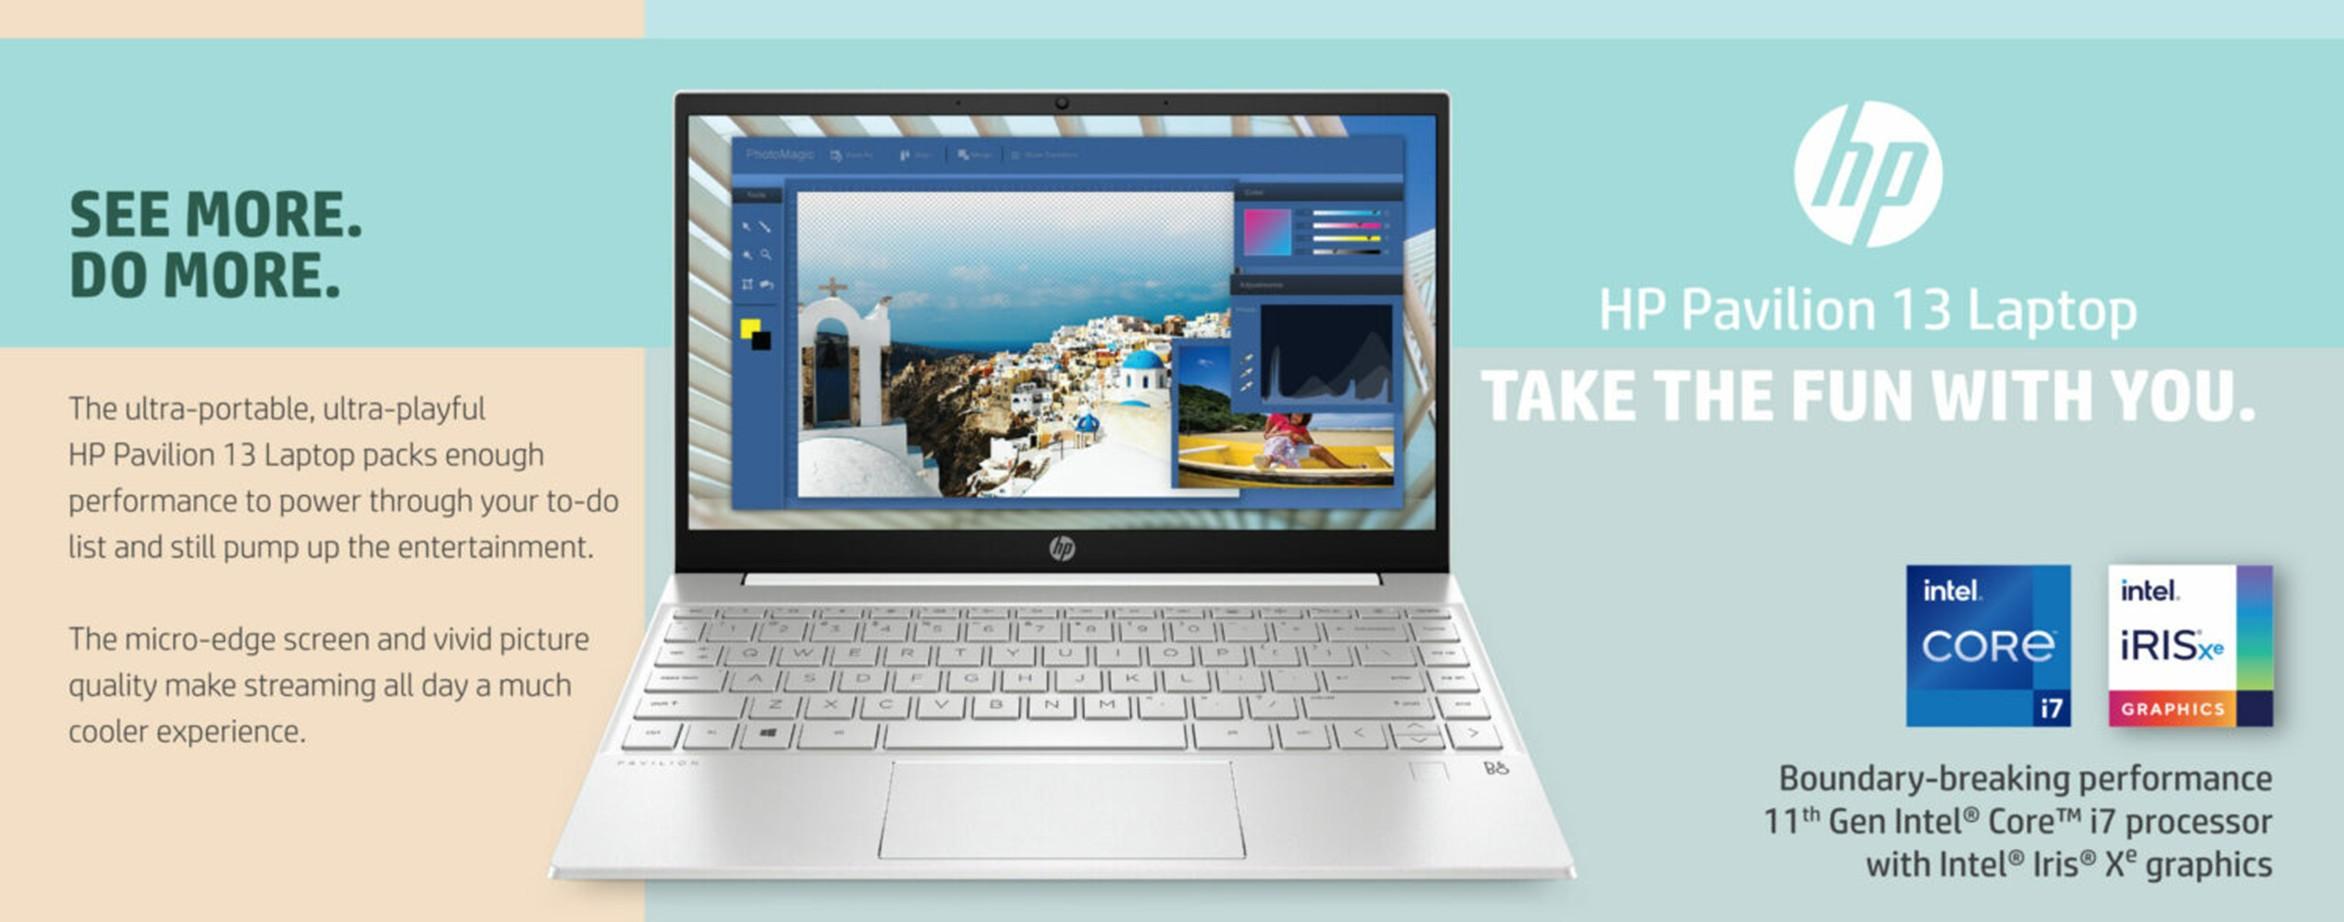 i5-8300H + GTX 1050 + Windows 10 ราคาถูกที่สุด แค่ 22,990 บาท